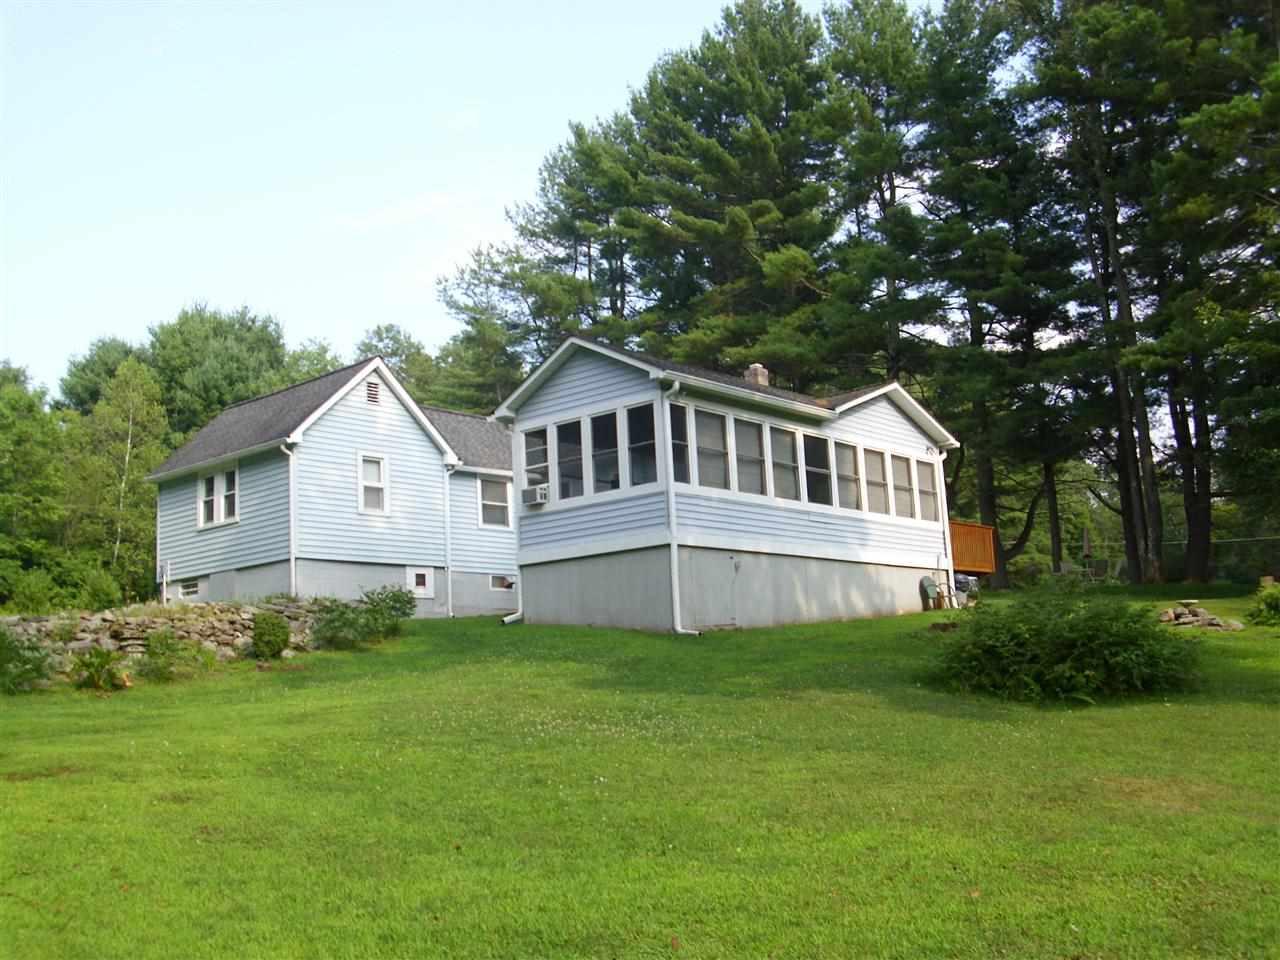 Real Estate for Sale, ListingId: 31769365, Cochecton,NY12726